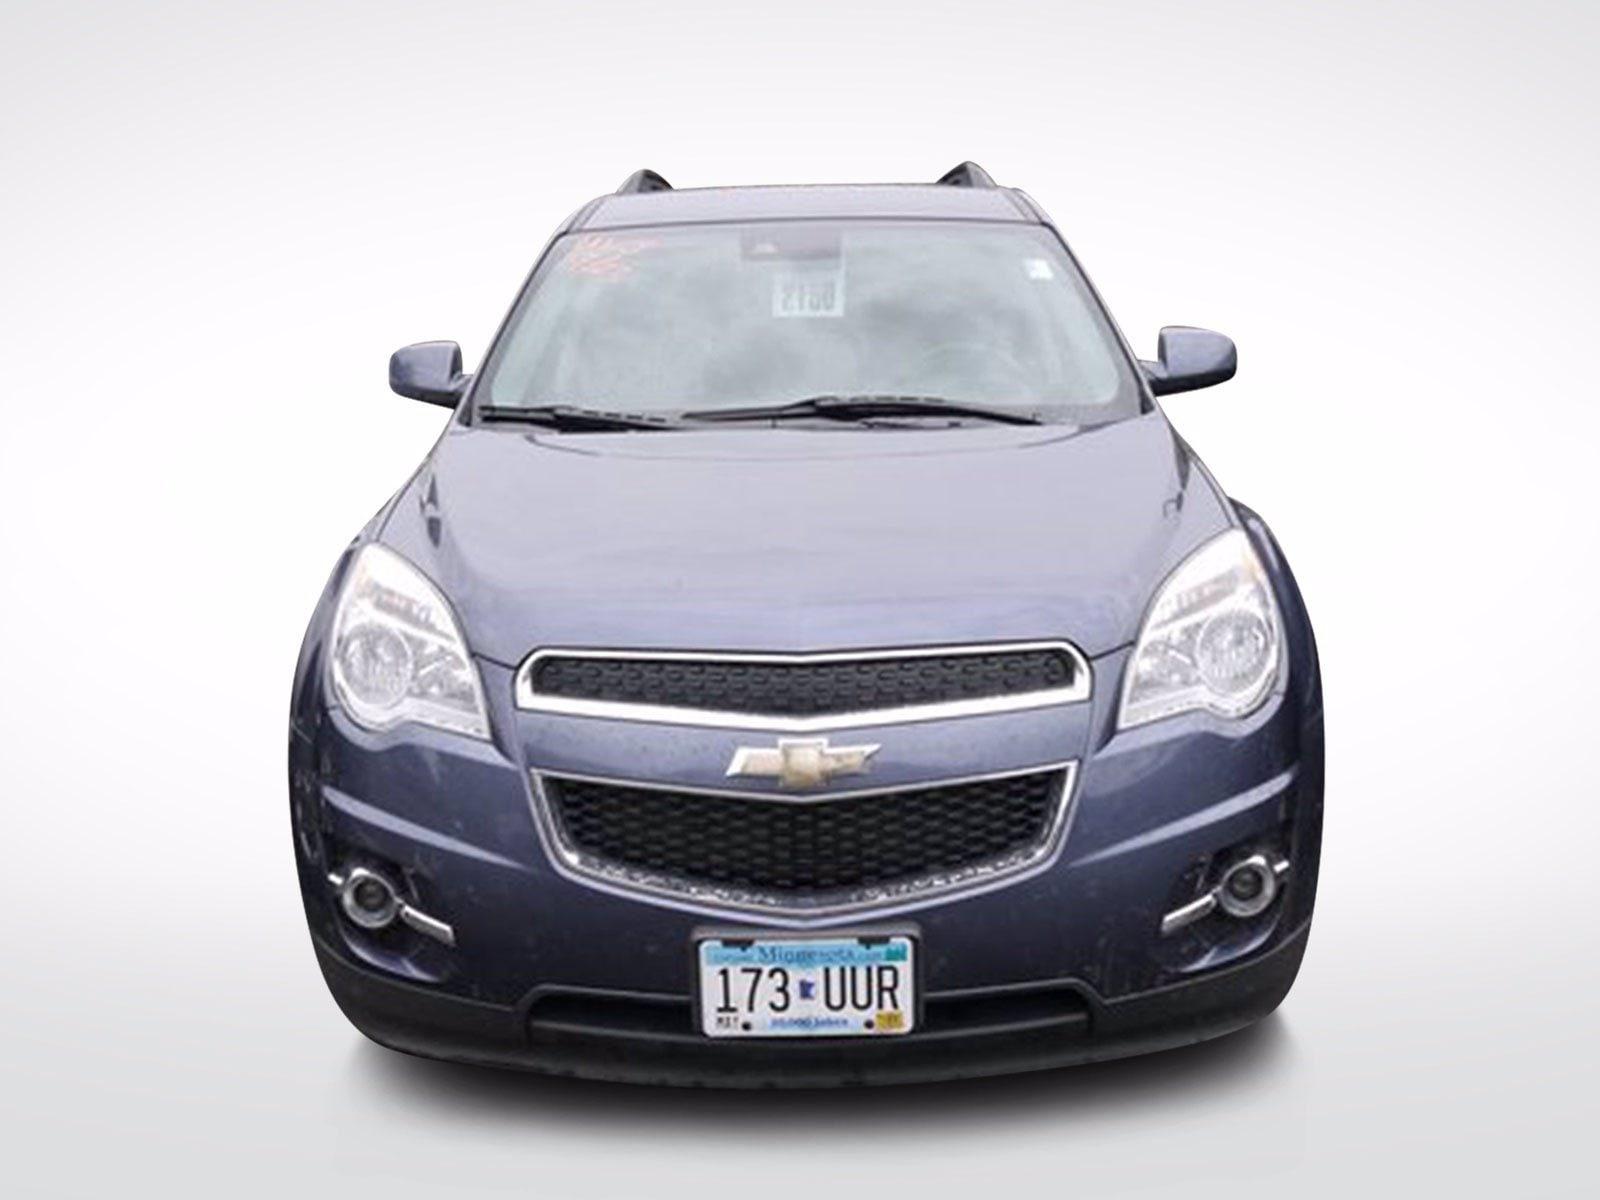 Used 2013 Chevrolet Equinox 2LT with VIN 2GNFLNEK6D6261629 for sale in Baxter, Minnesota